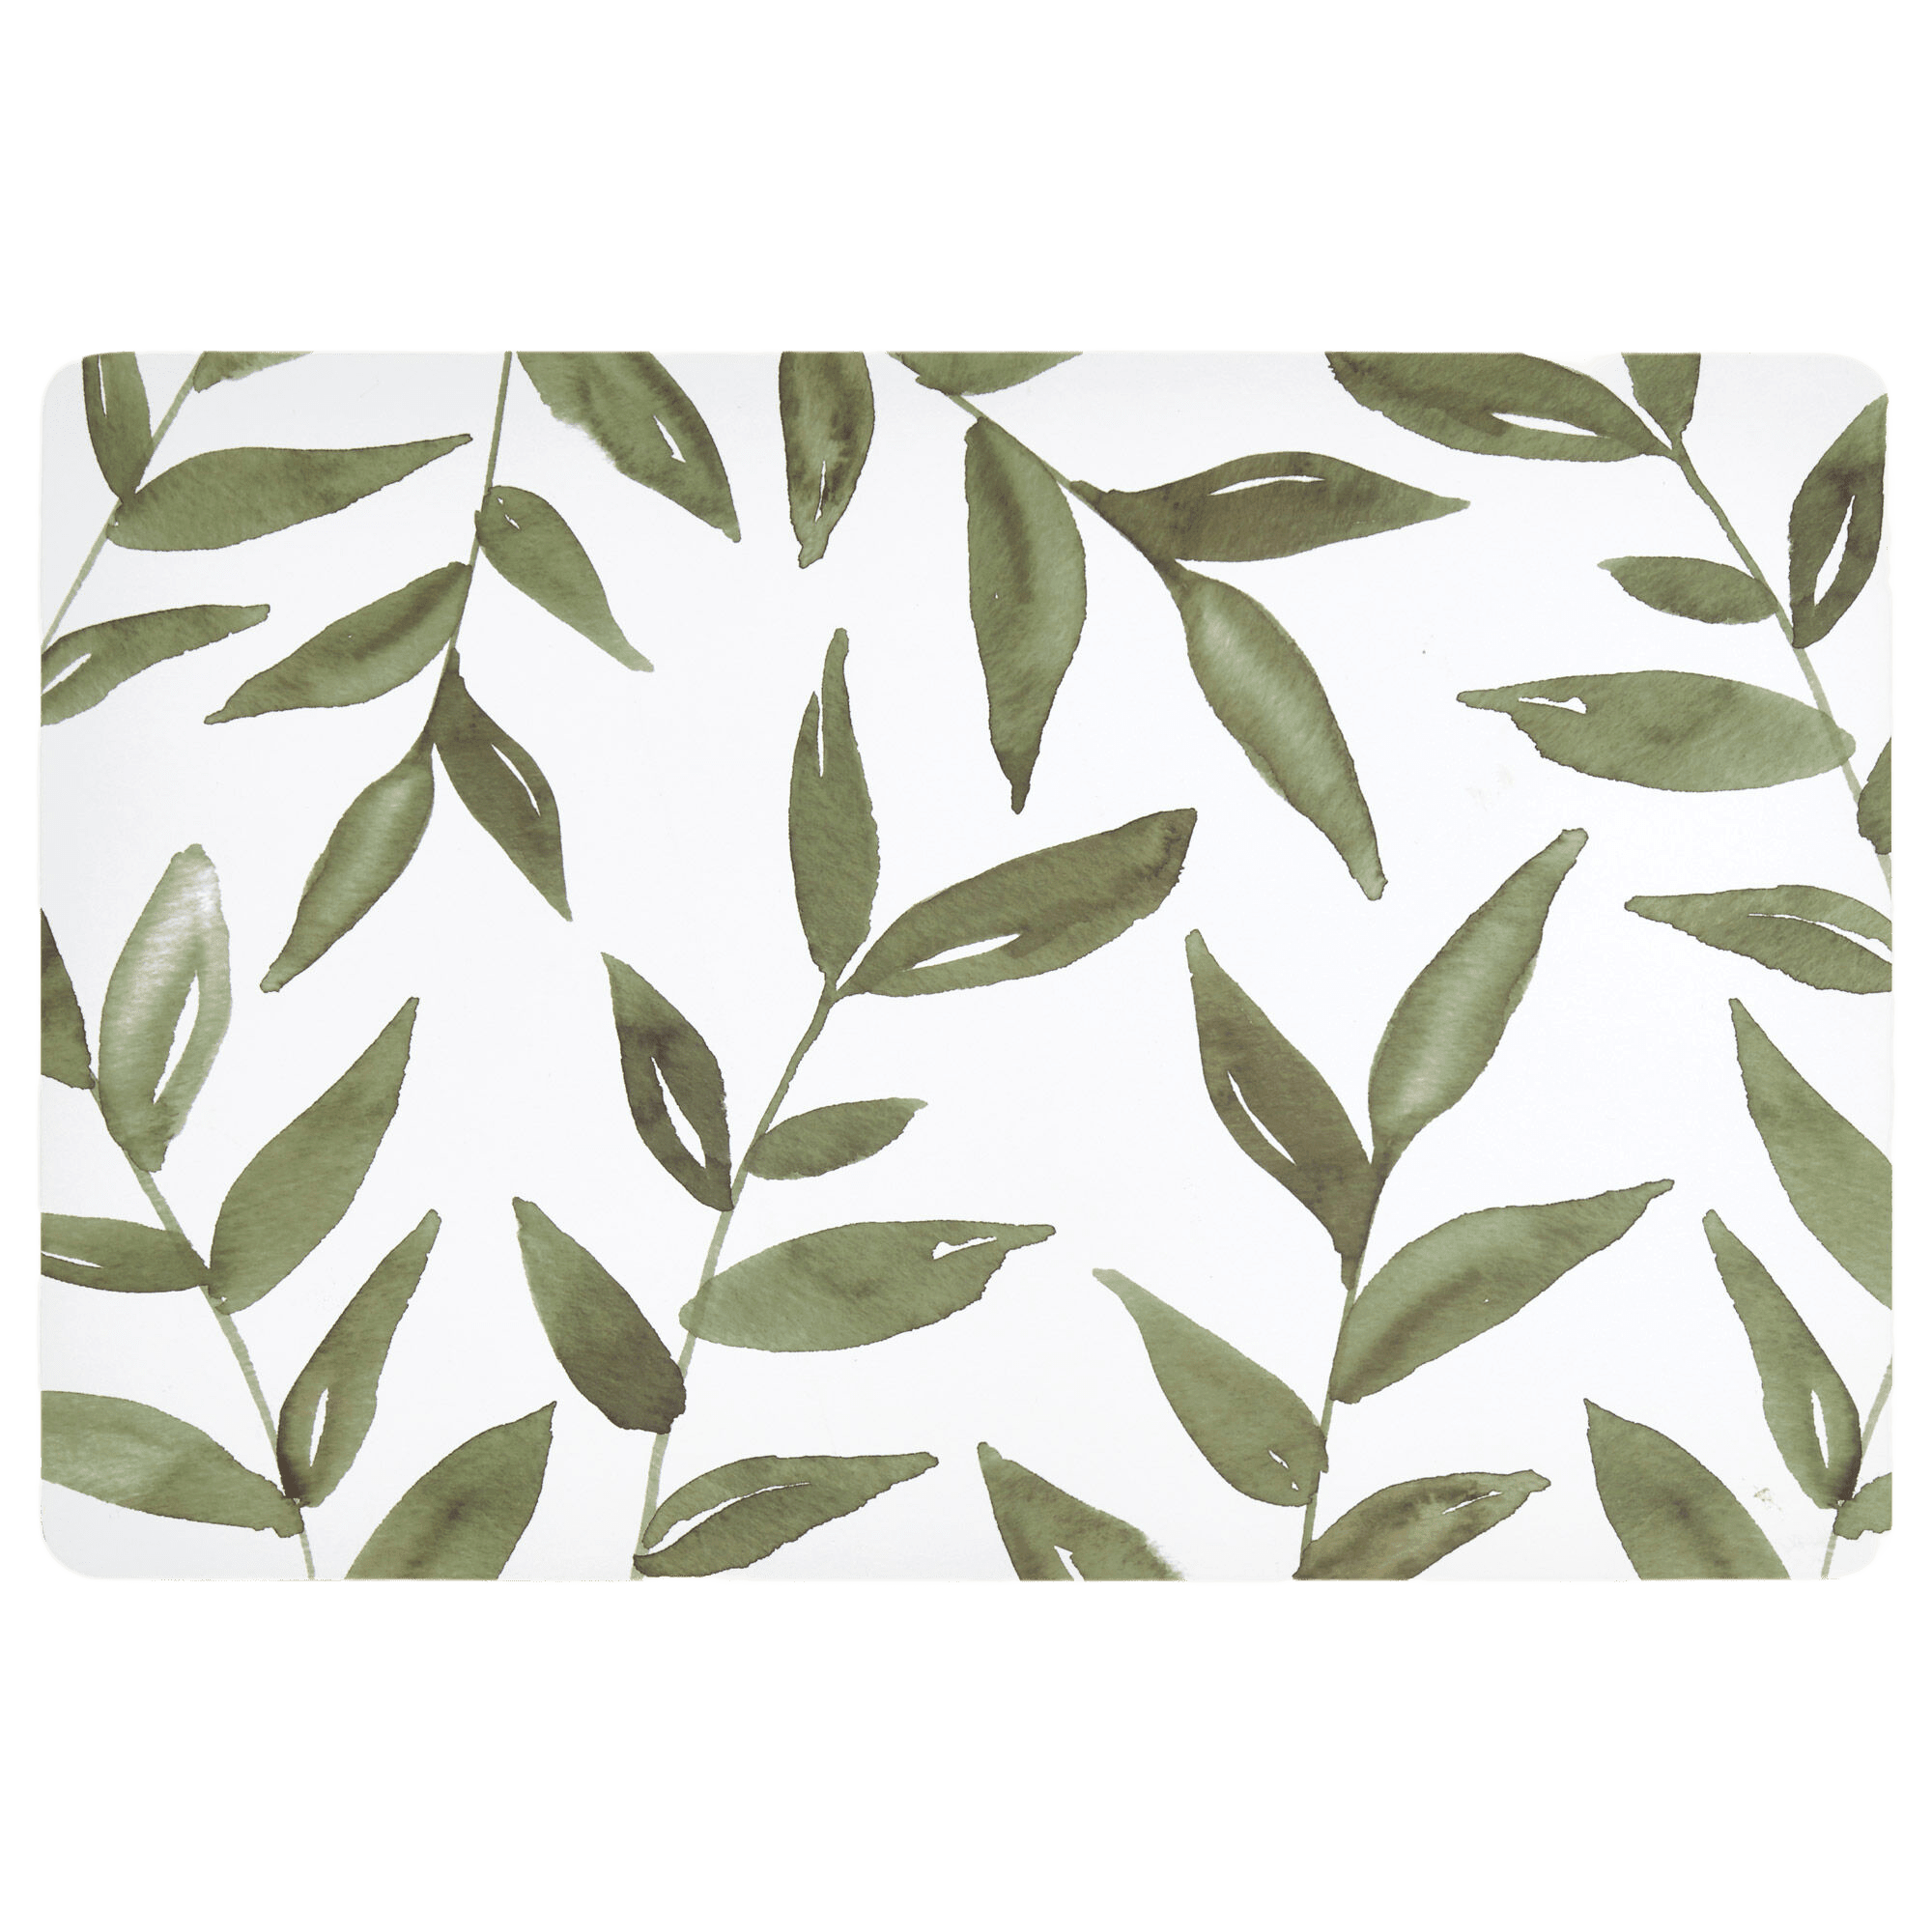 Leaf-Printed Placemat